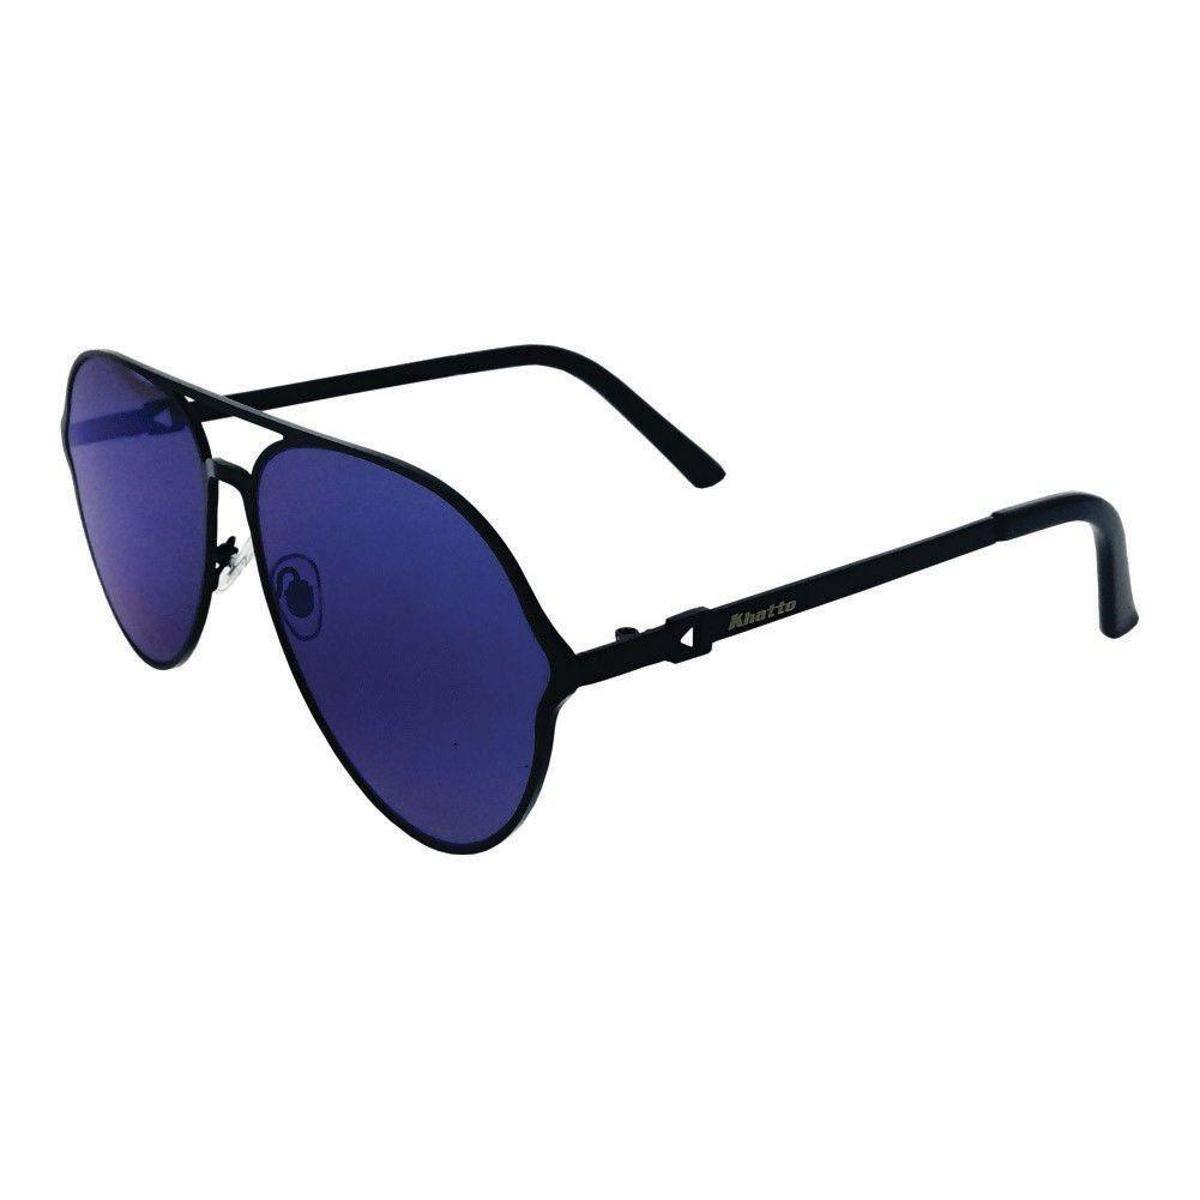 Óculos de Sol Khatto Aviador Details - Compre Agora   Zattini d5c10934cf